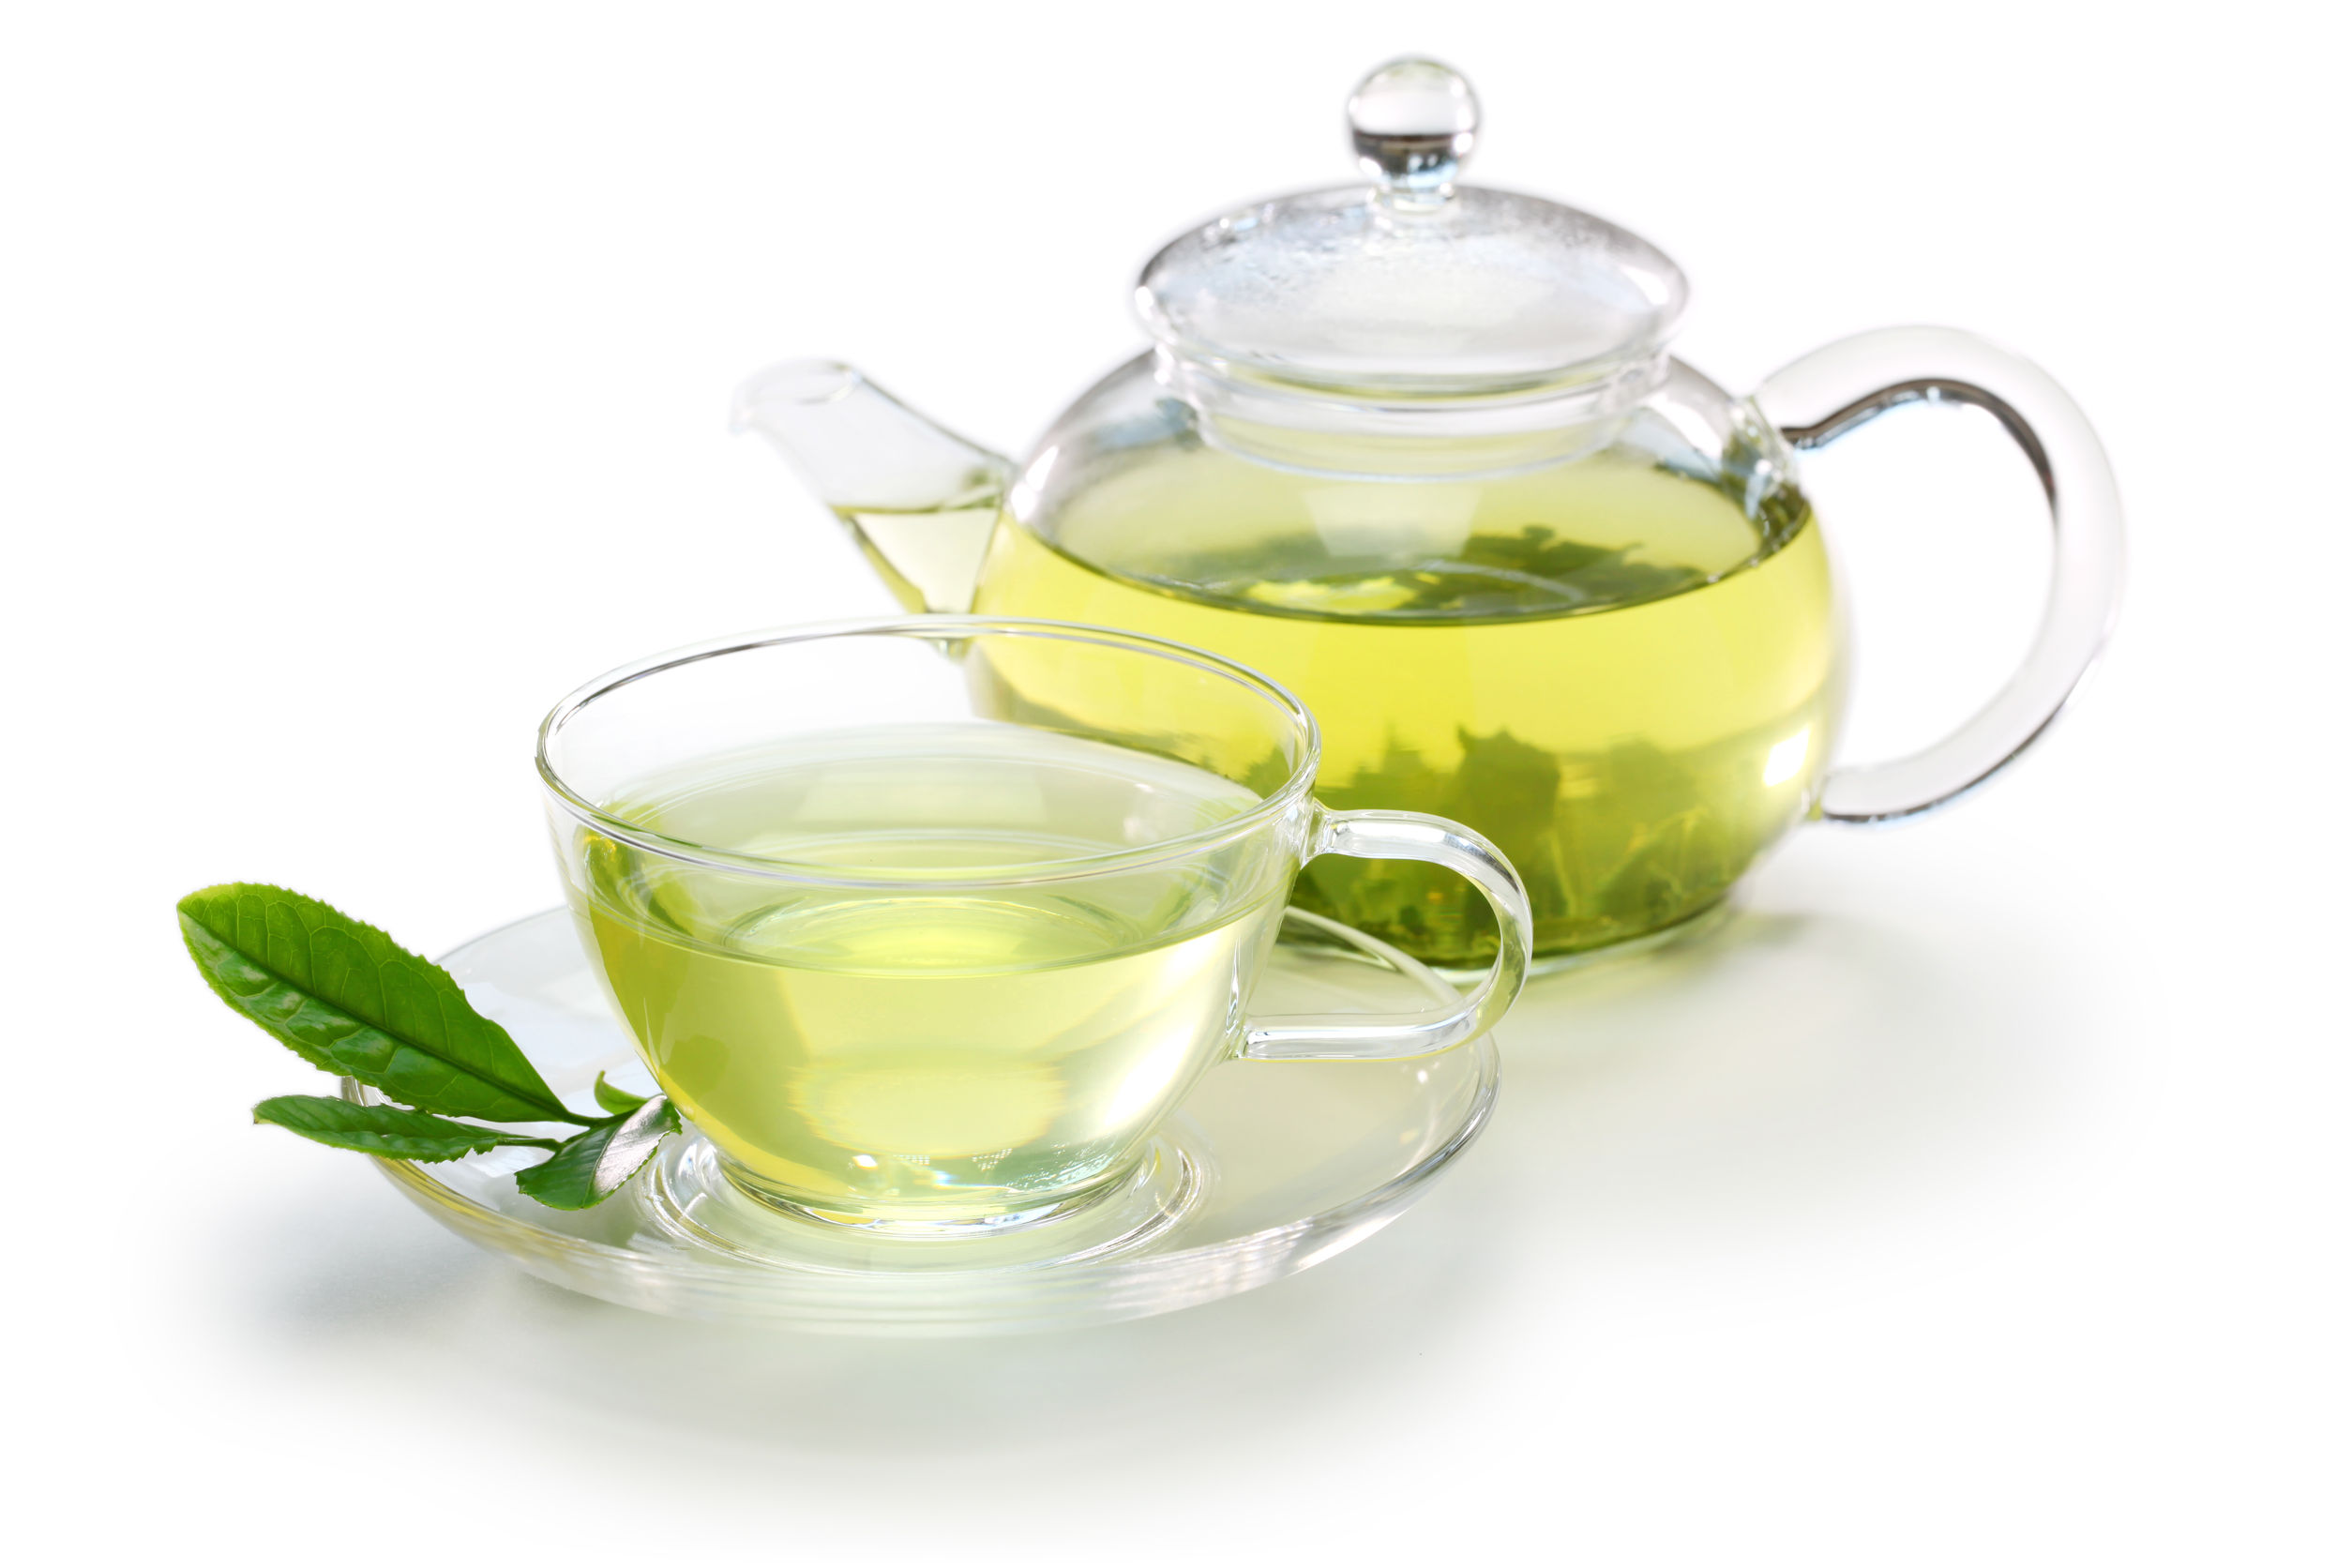 39663506_l El té blanco ideal para perder peso